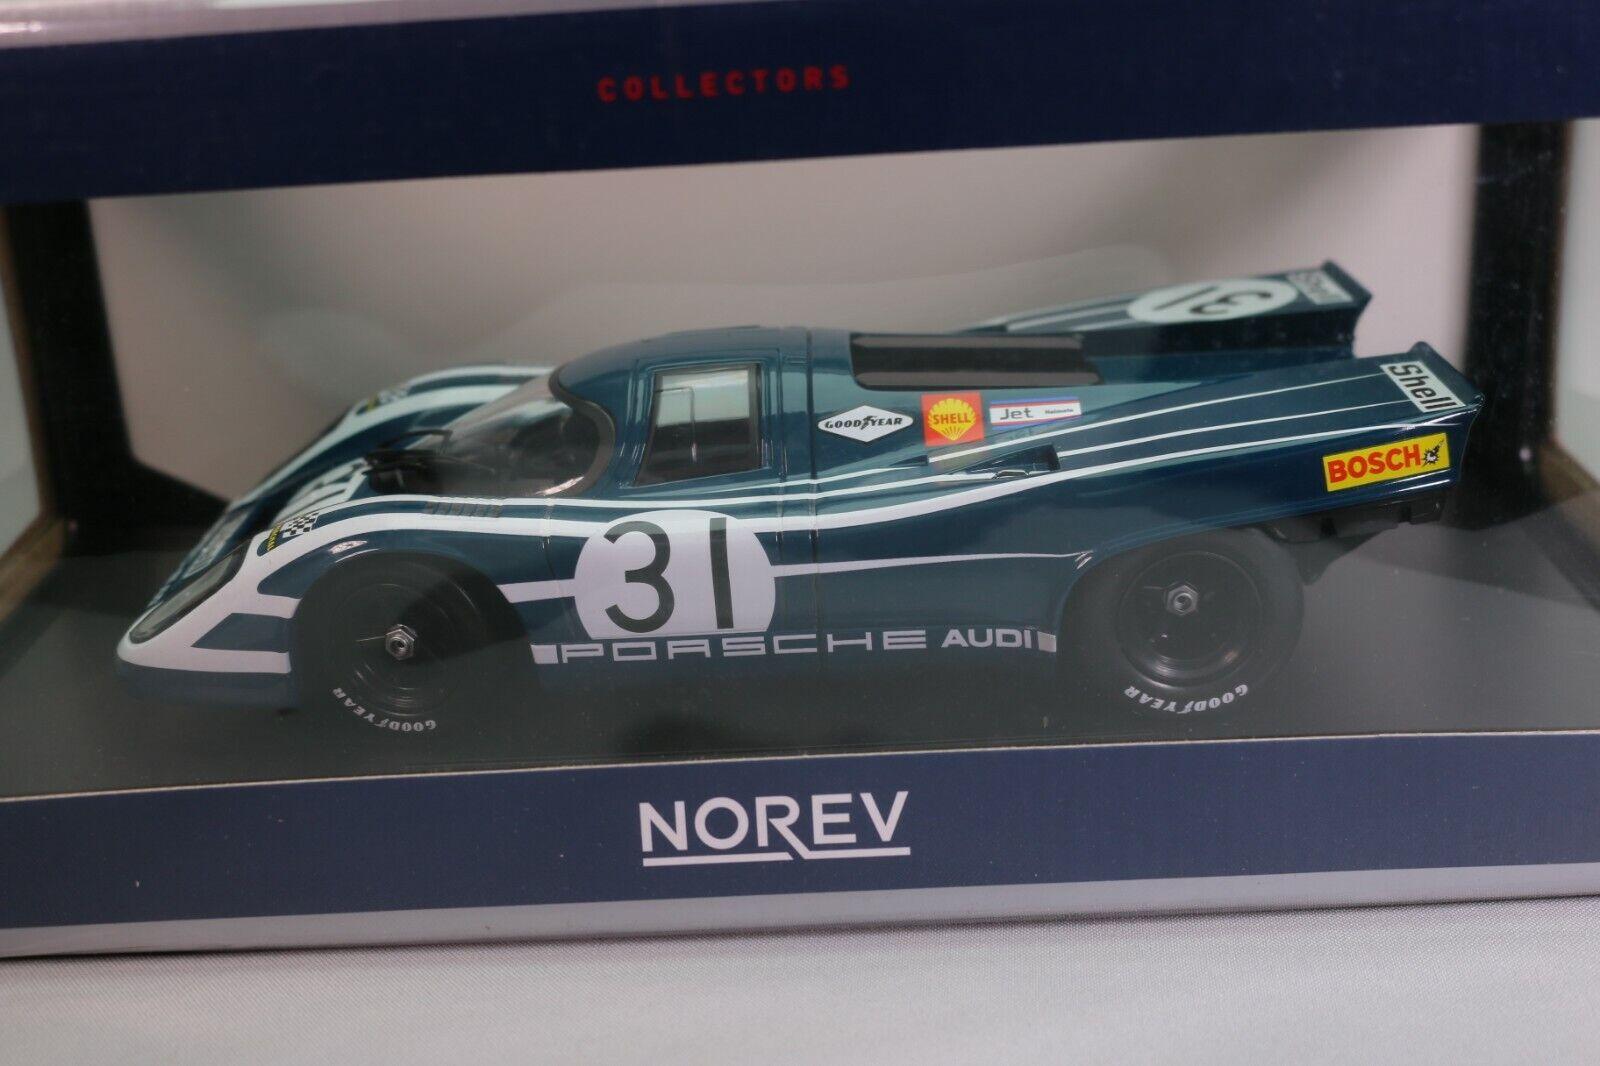 ZD024 NOREV 187583 Voiture 1 18 Porsche 917K Watkins Glen - Hours 1970 blu verde